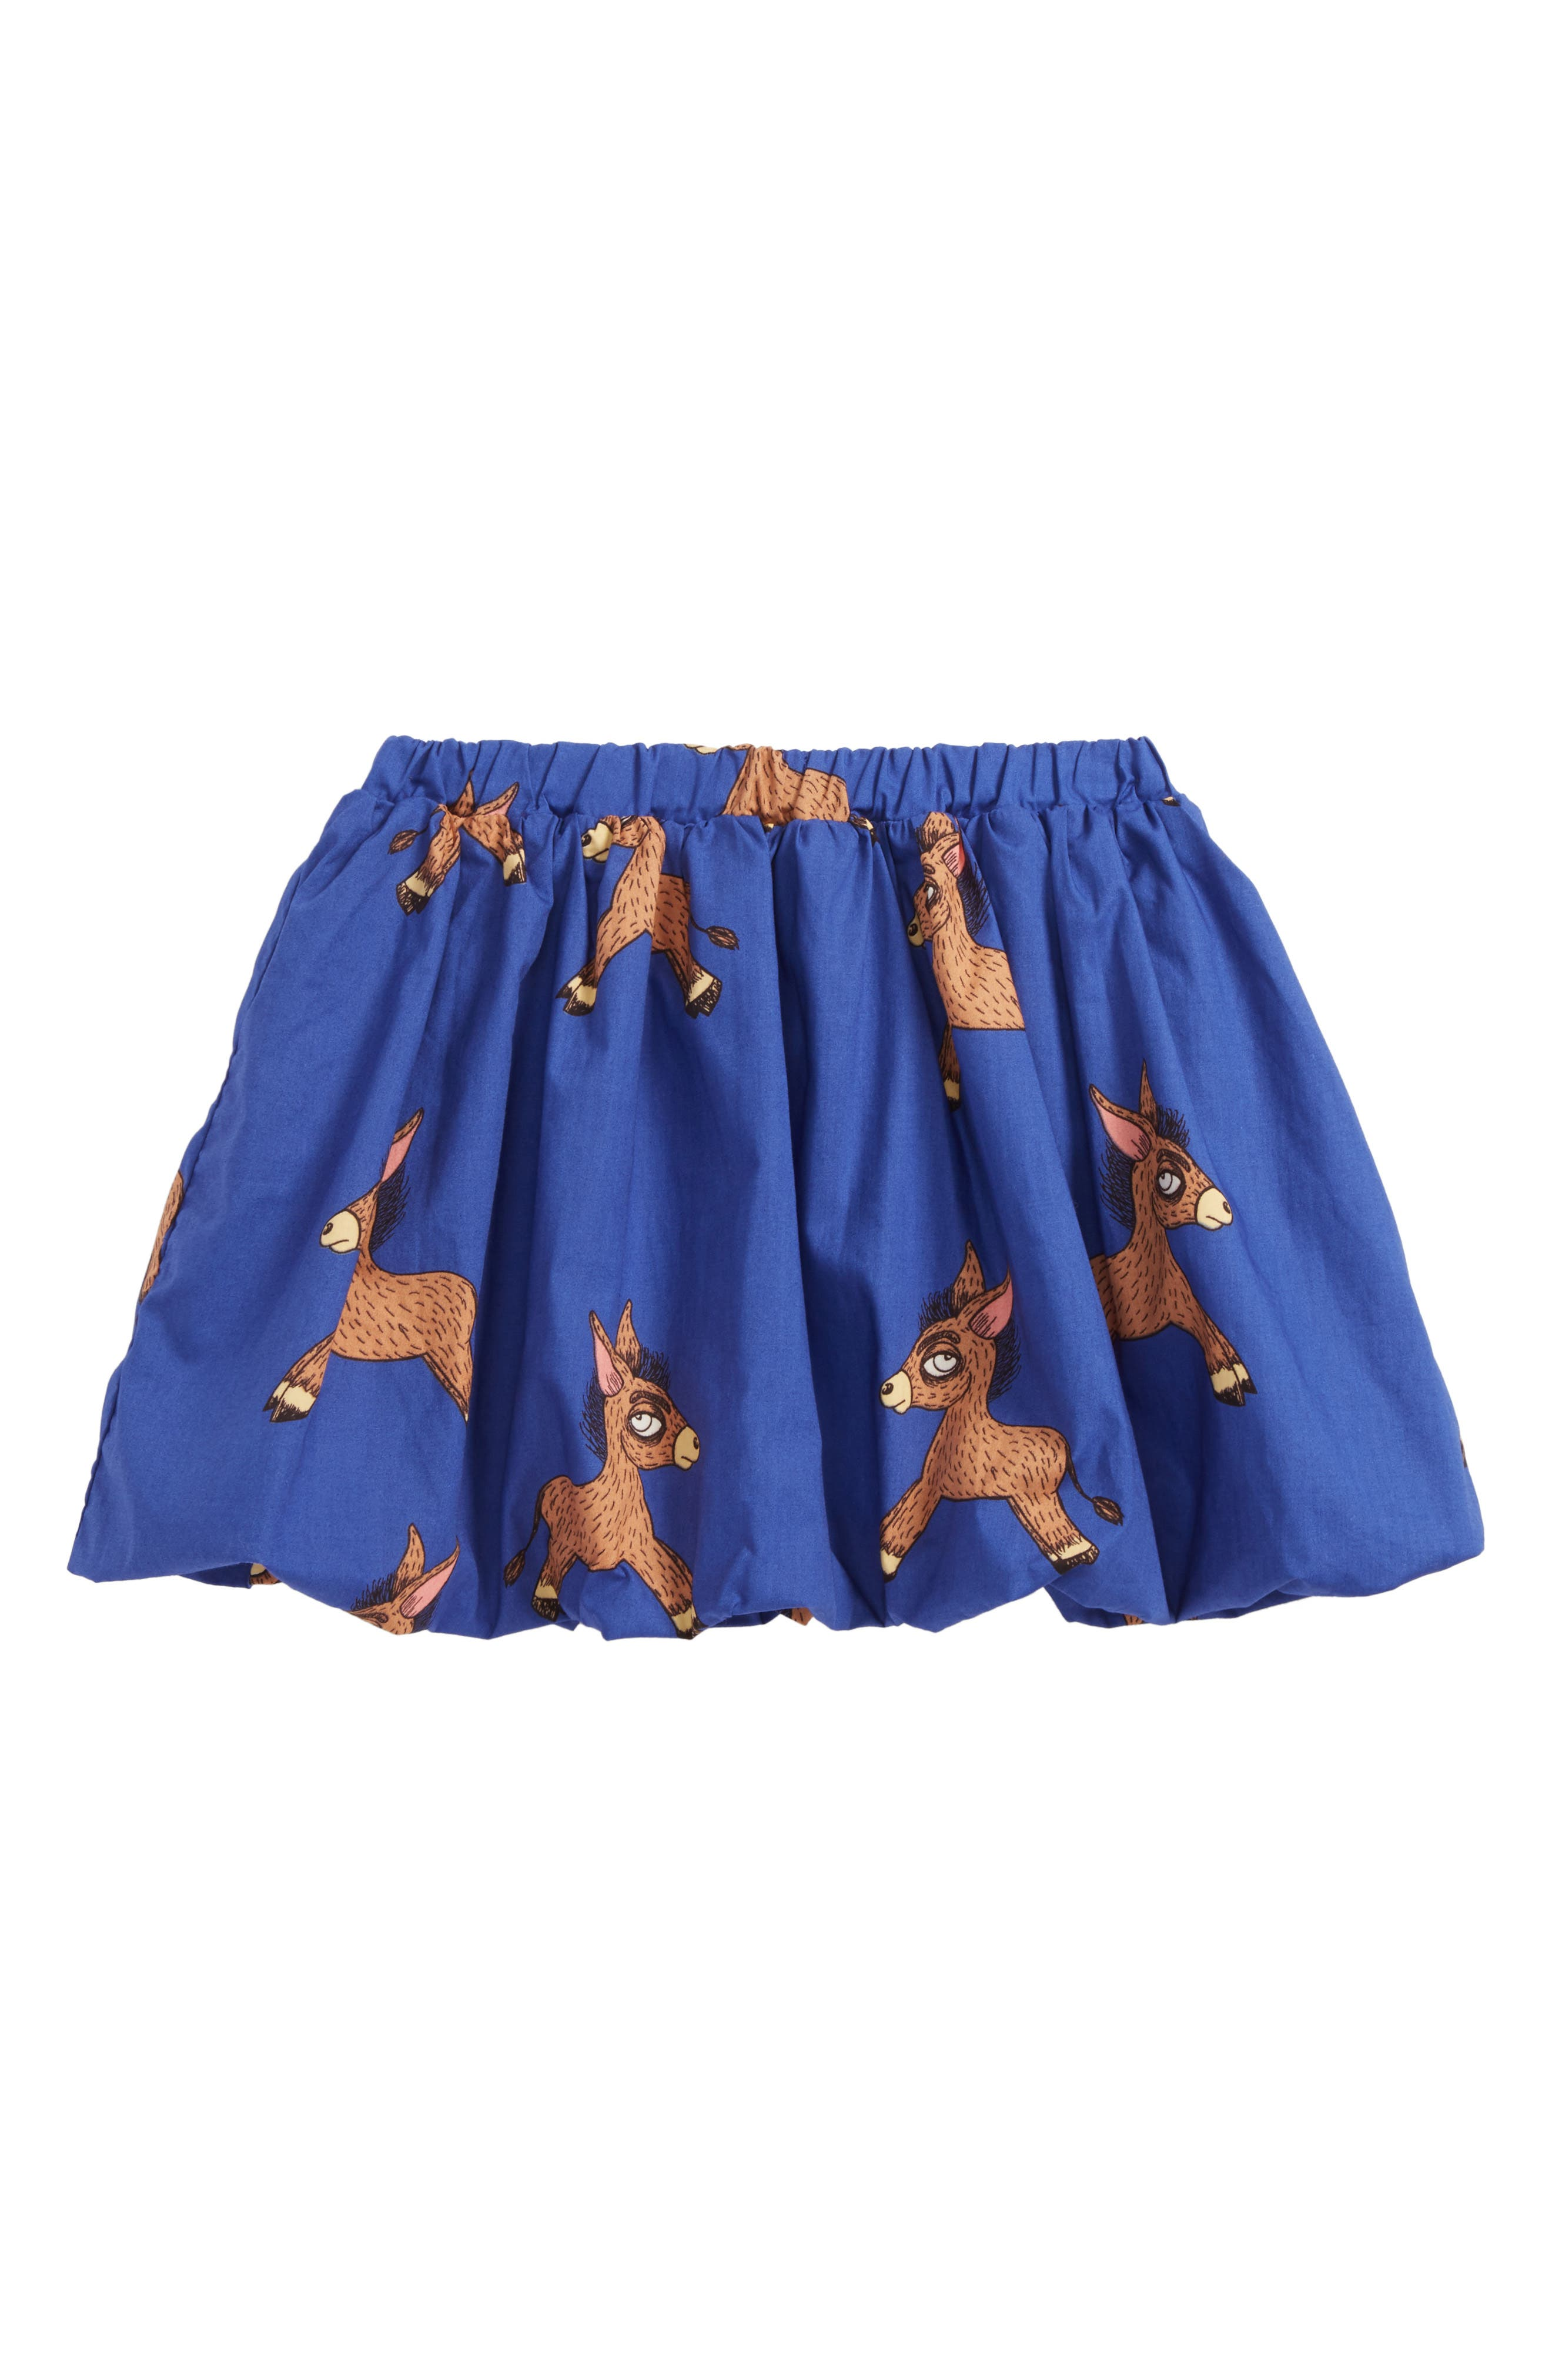 Donkey Print Woven Organic Cotton Balloon Skirt,                             Main thumbnail 1, color,                             400